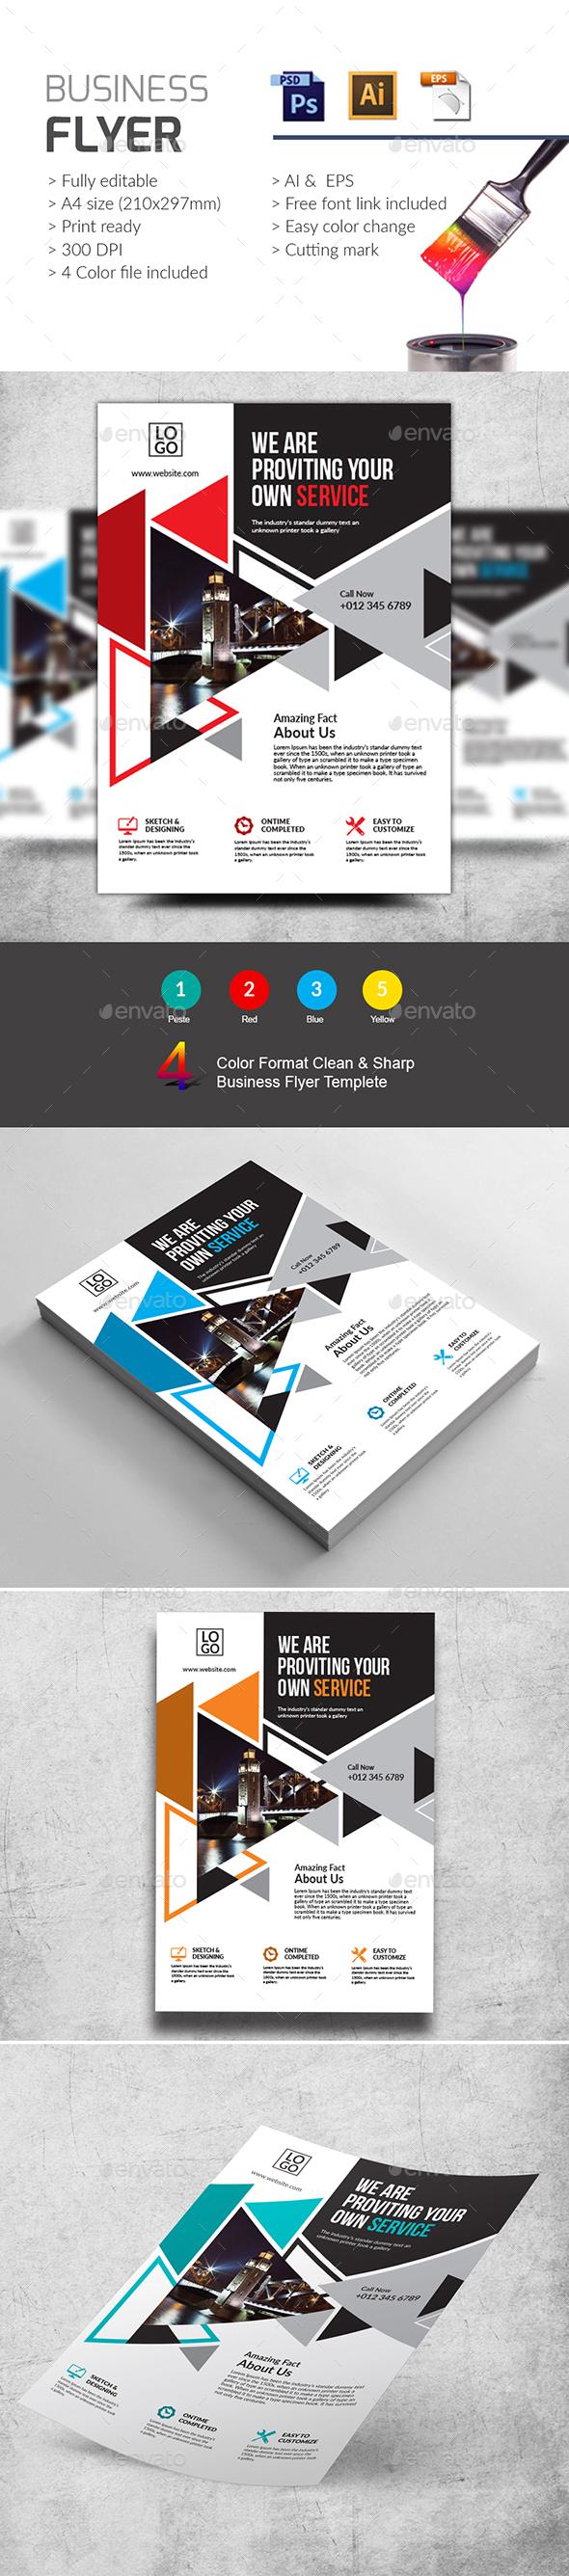 Business Flyer Template PSD, Vector EPS, AI Illustrator | Flyer ...